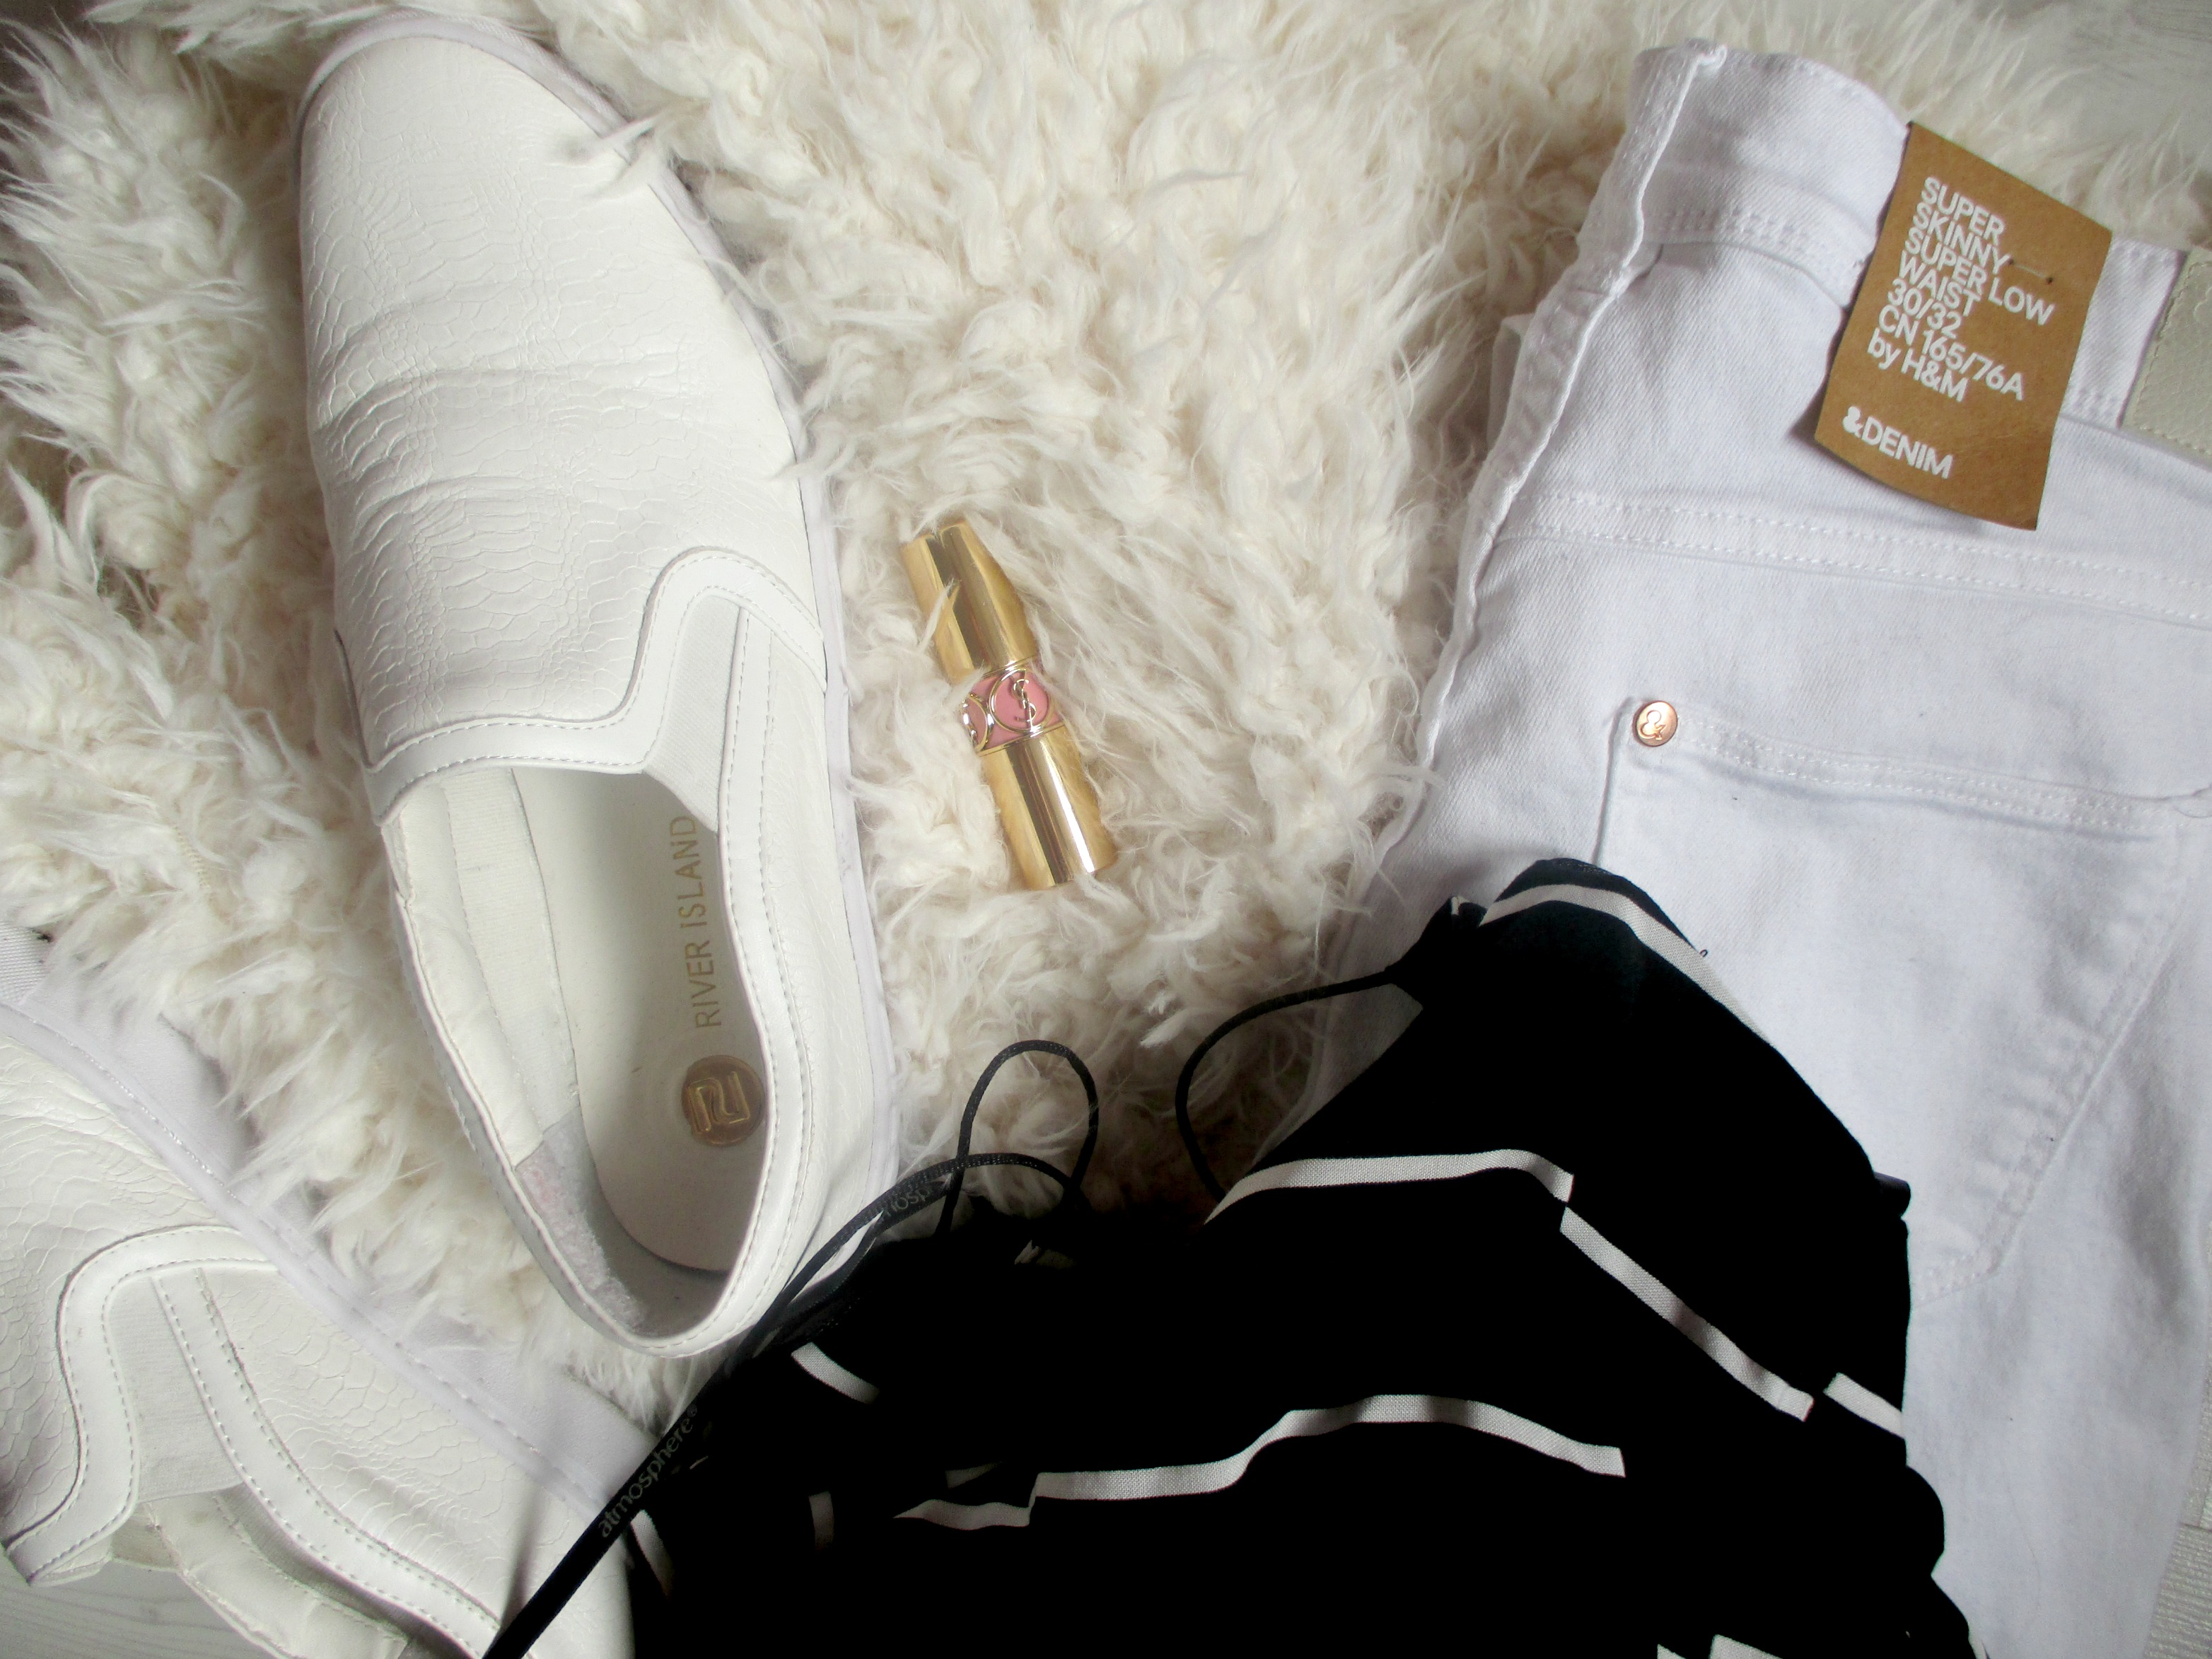 8580a13ceb7 Shoplog May (Primark, Only, Yves Saint Laurent, H&M) - Keybykim